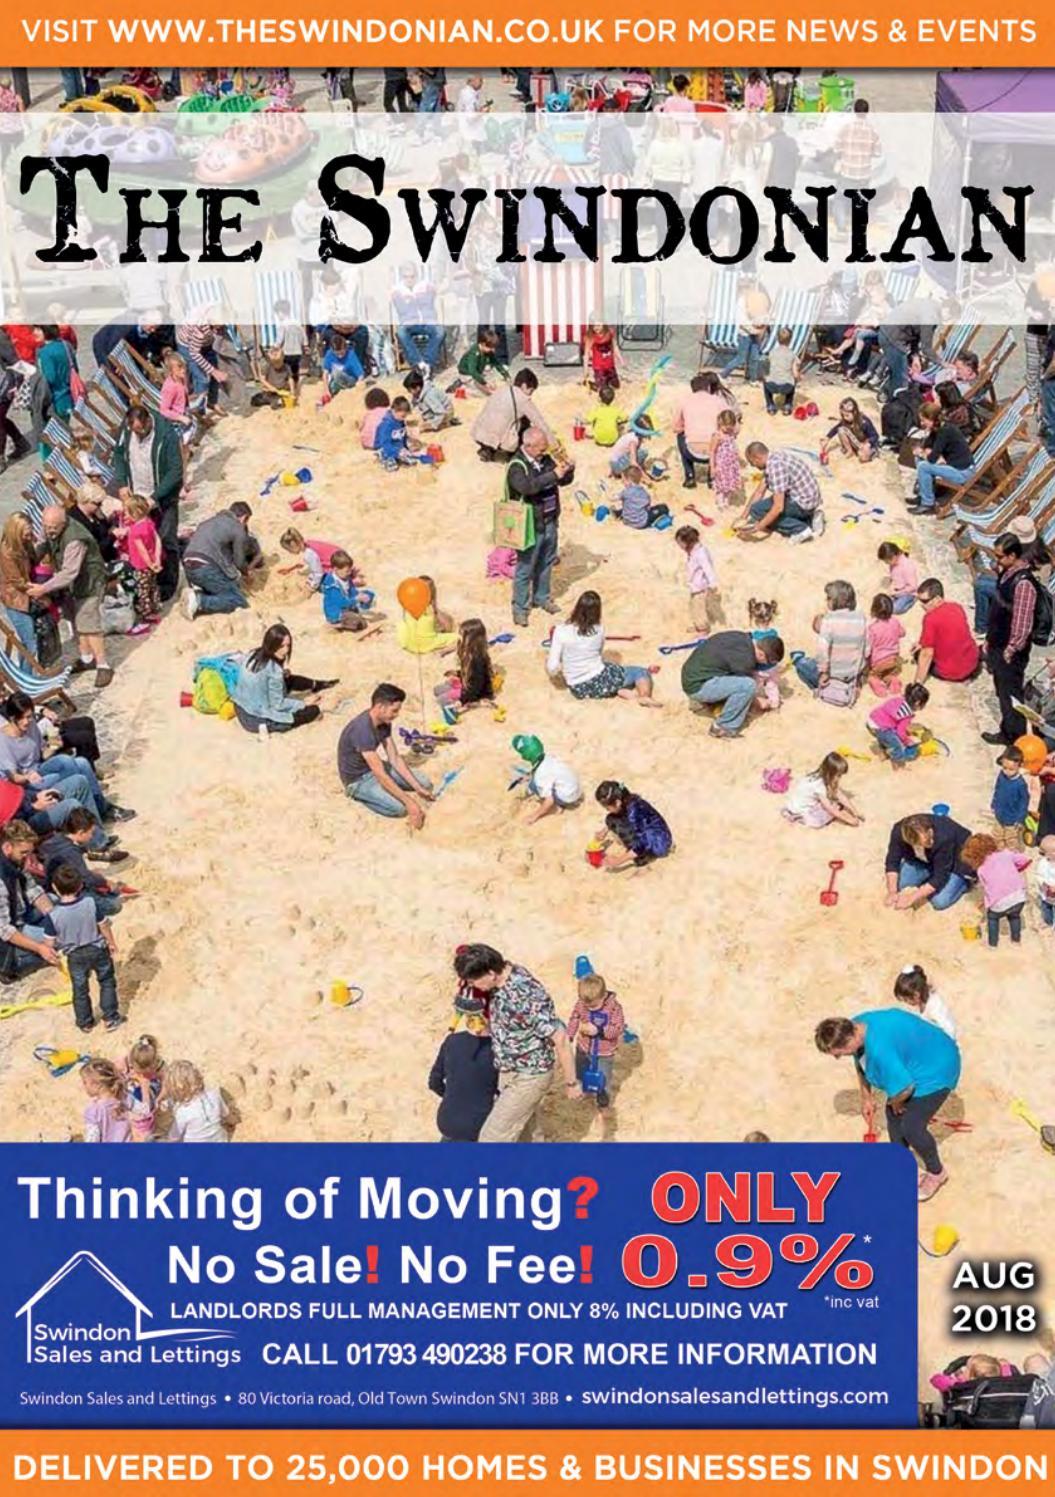 The Swindonian August 2018 by The Swindonian - issuu